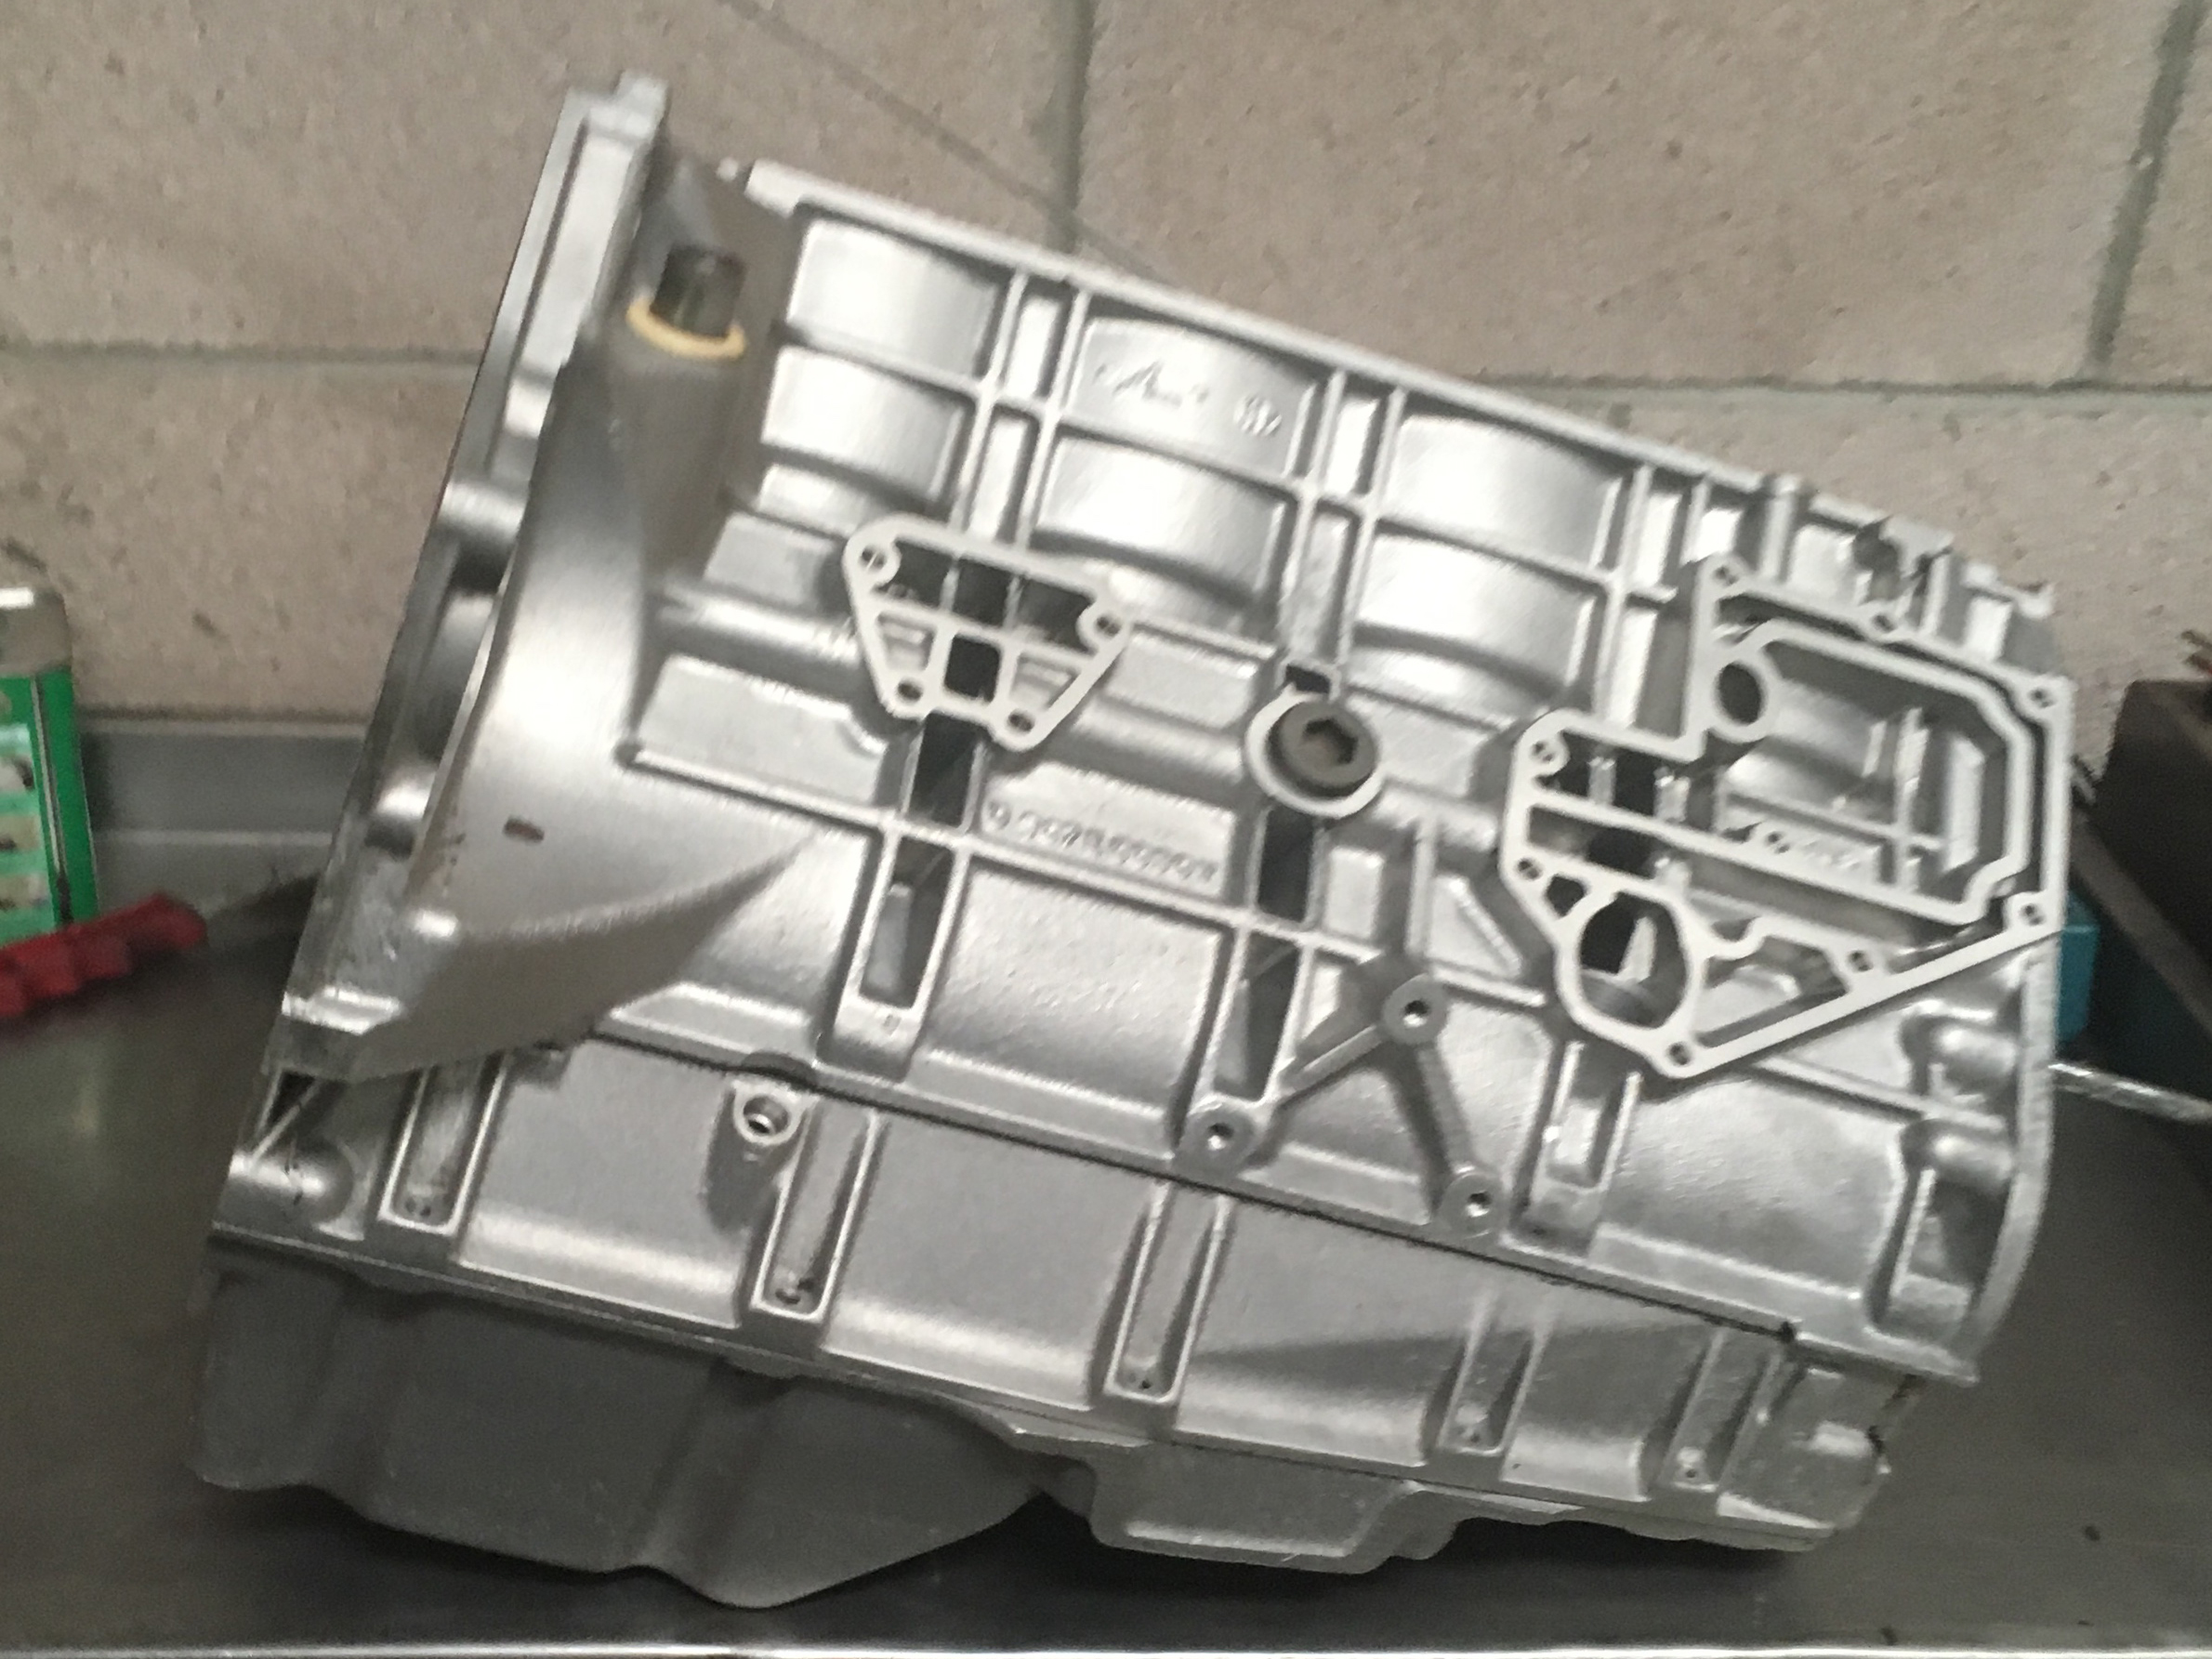 Lotus Esprit 4 Cylinder 900 series engine block after the Esprit Enginering aqua shot blasting process ready for inspection.